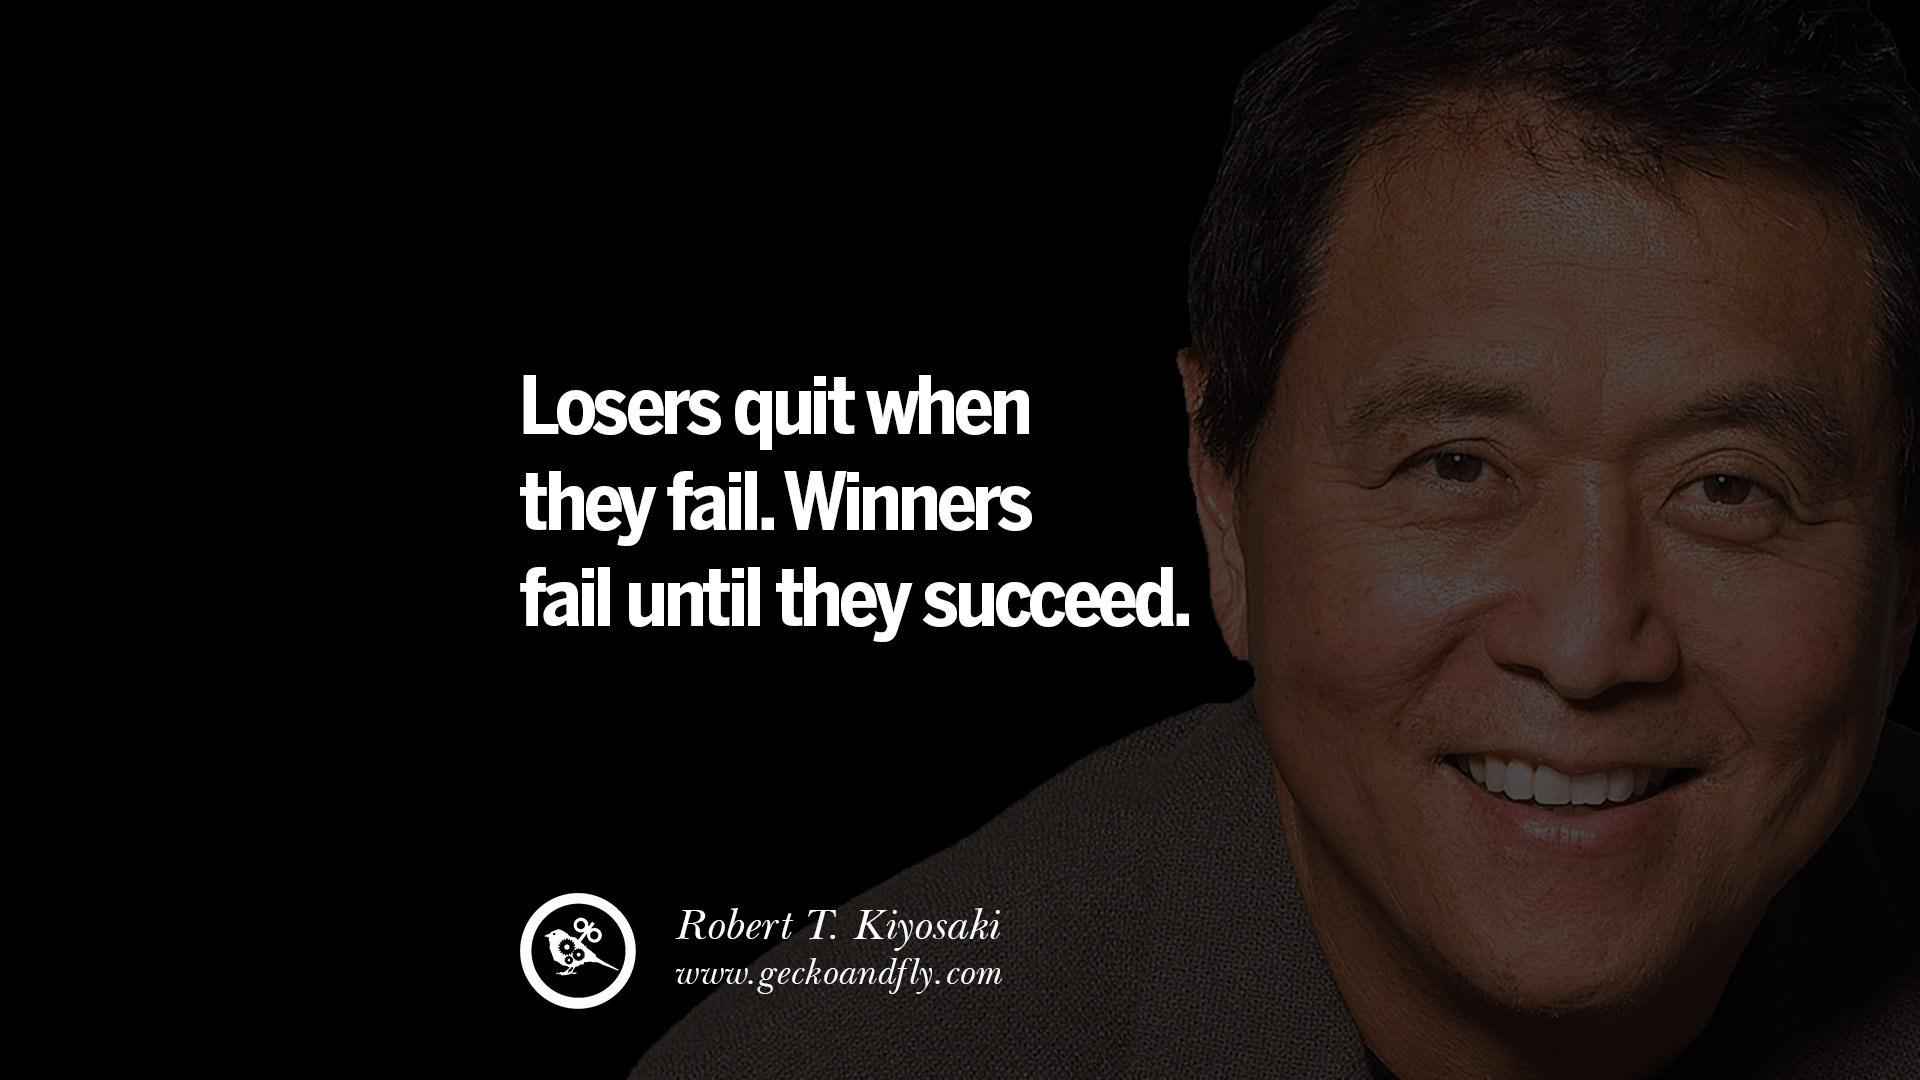 Robert Kiyosaki Quotes Rich